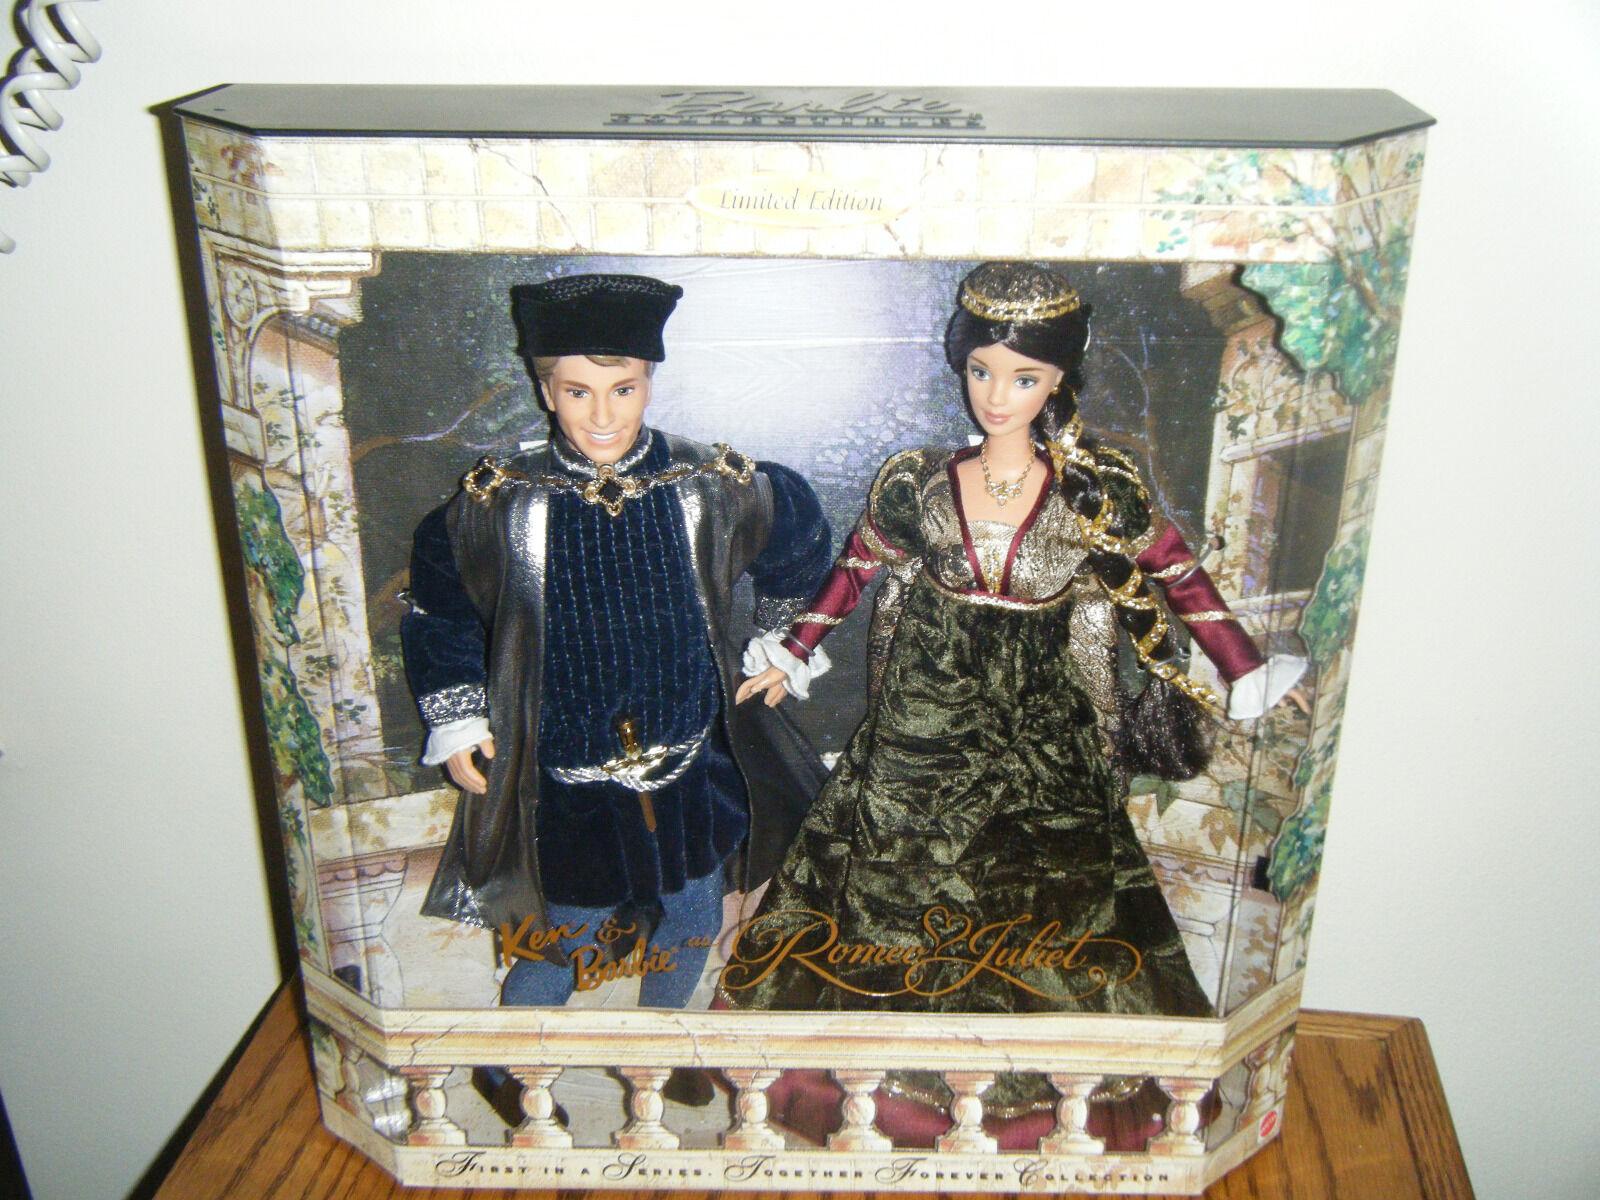 1997 Shakespeare's Romeo & Juliet (Ken & Barbie) Conjunto de Regalo-mnrfb